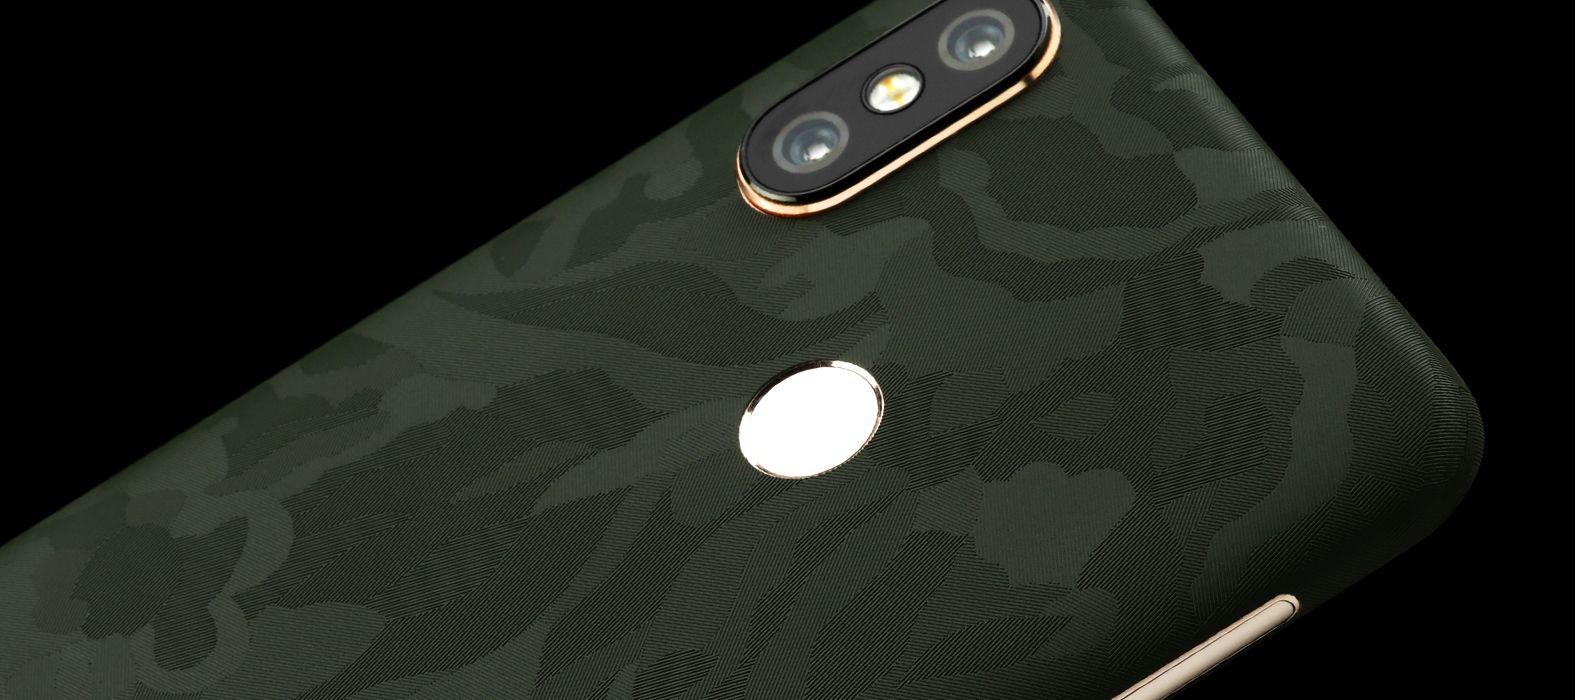 Xiaomi Redmi 6 Pro Green Camo Skins